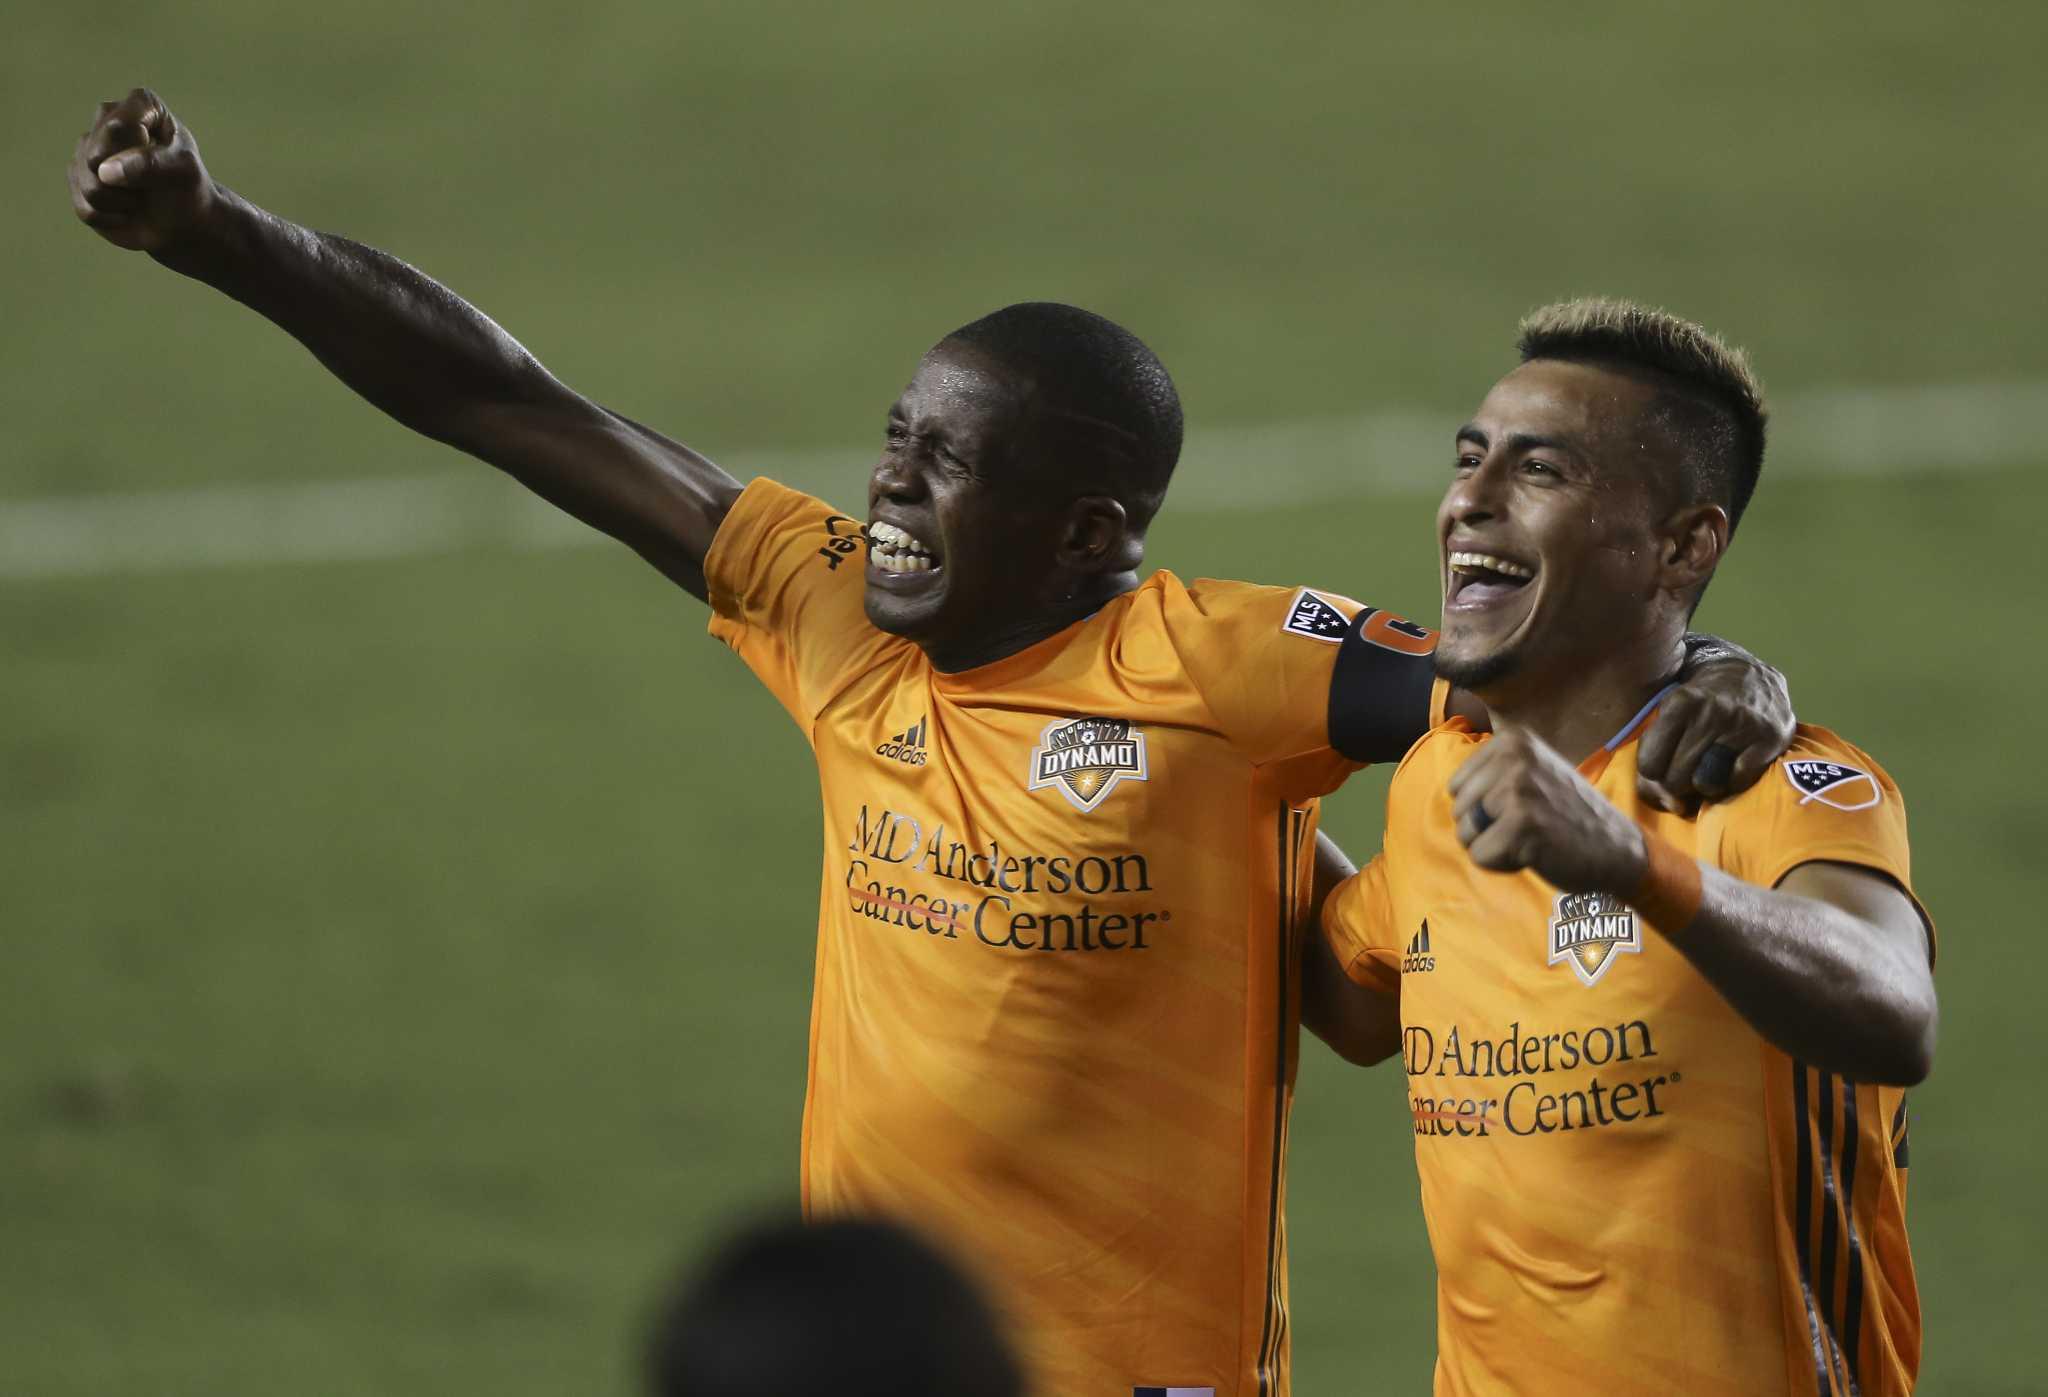 Dynamo snatches his unbeaten streak against FC Dallas